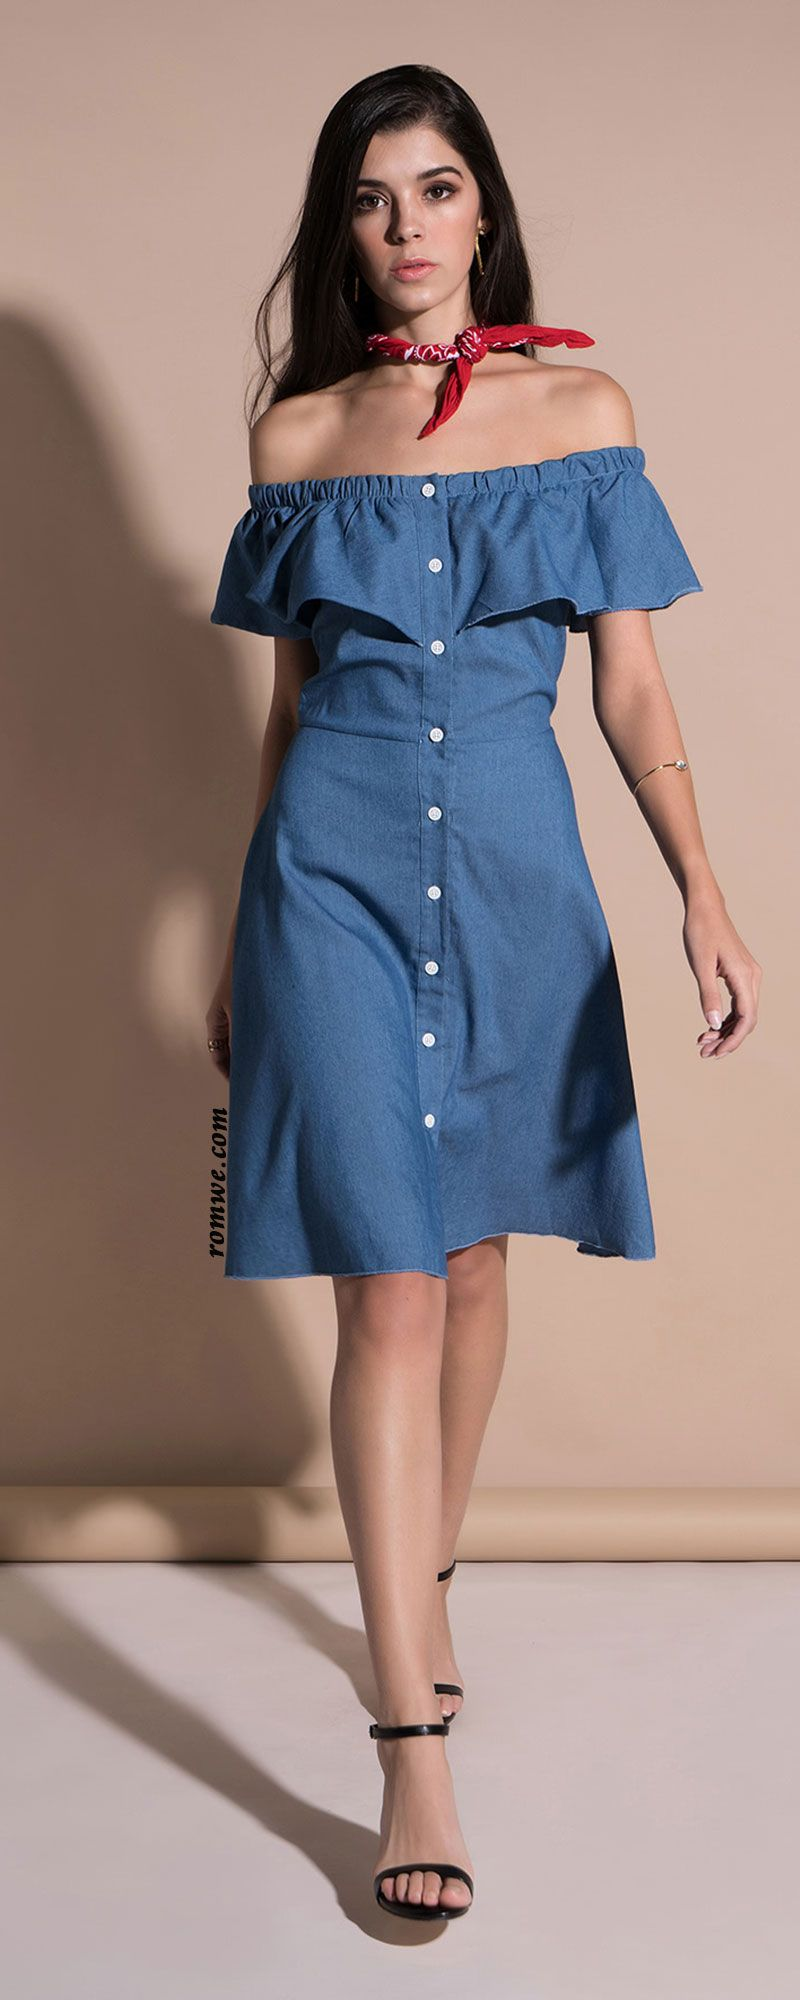 Denim Off Shoulder Ruffle Dress Pretty dresses, Fashion